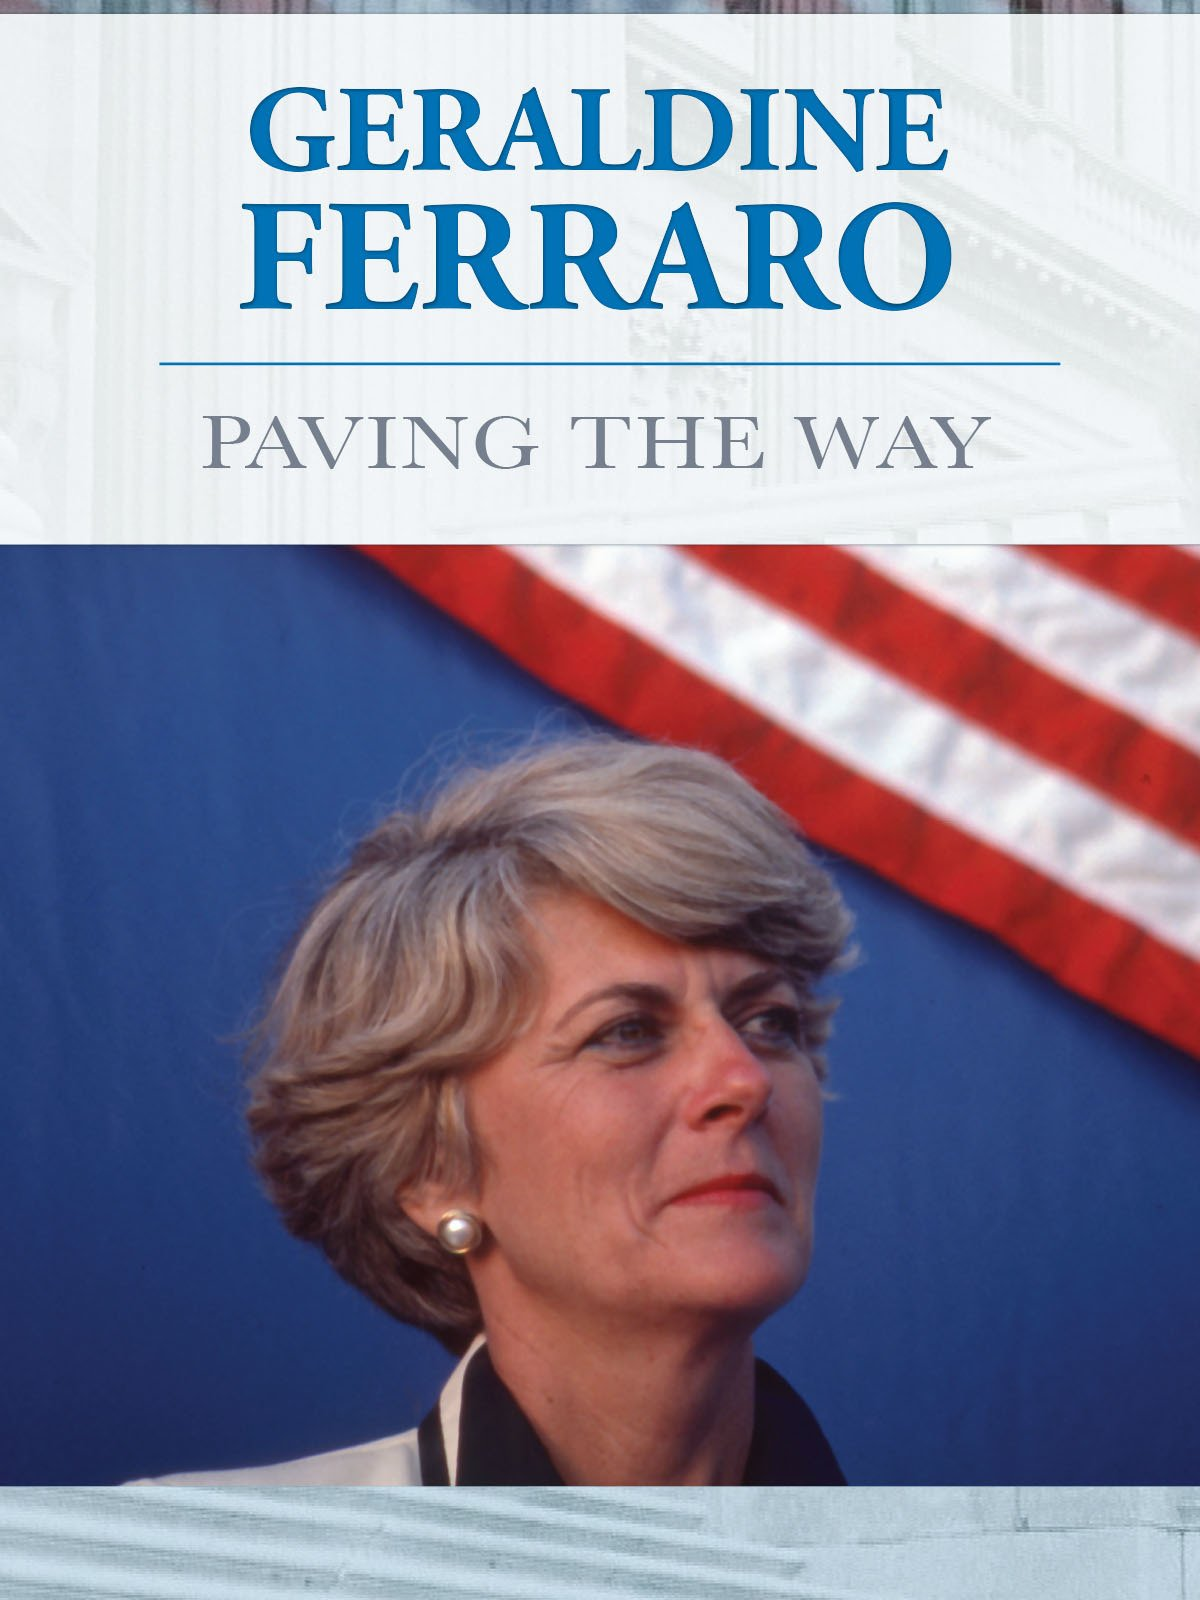 Geraldine Ferraro Paved the Way for Female Politicians Everywhere – RIP